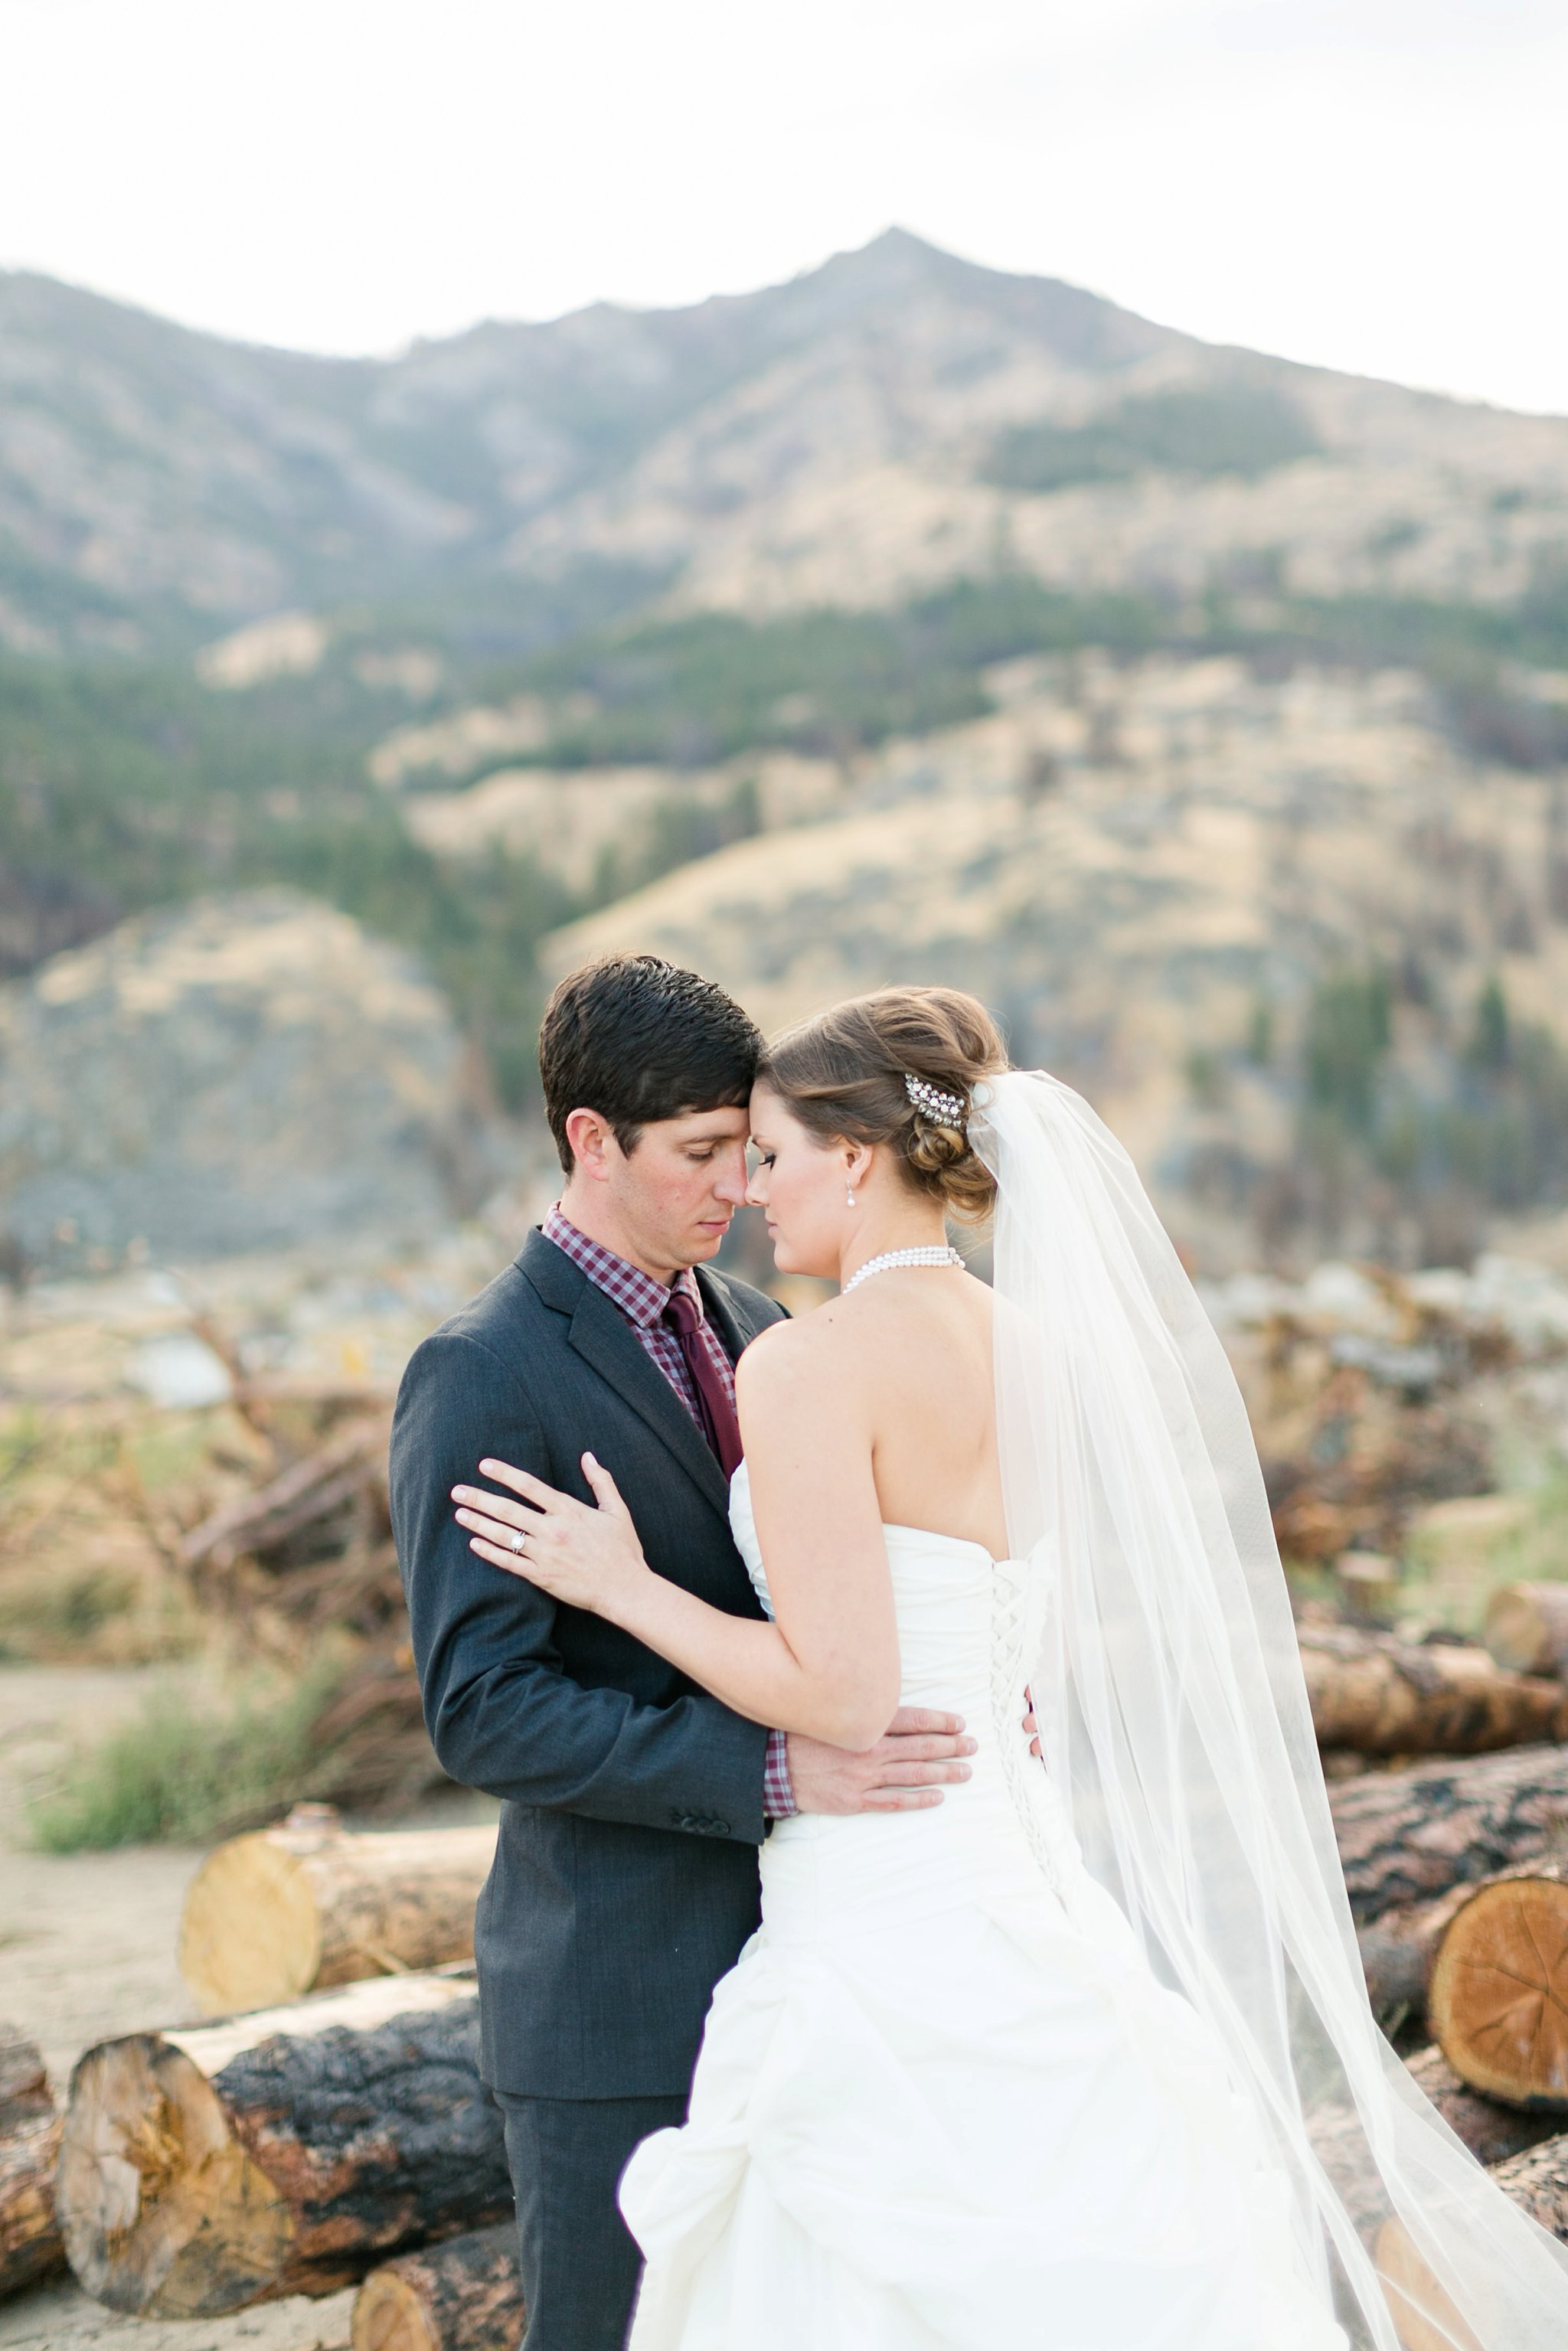 Chelan Washington Wedding Photos Megan Kelsey Photography Delight Wedding Workshop Styled Shoot Annalee & Scot-147.jpg